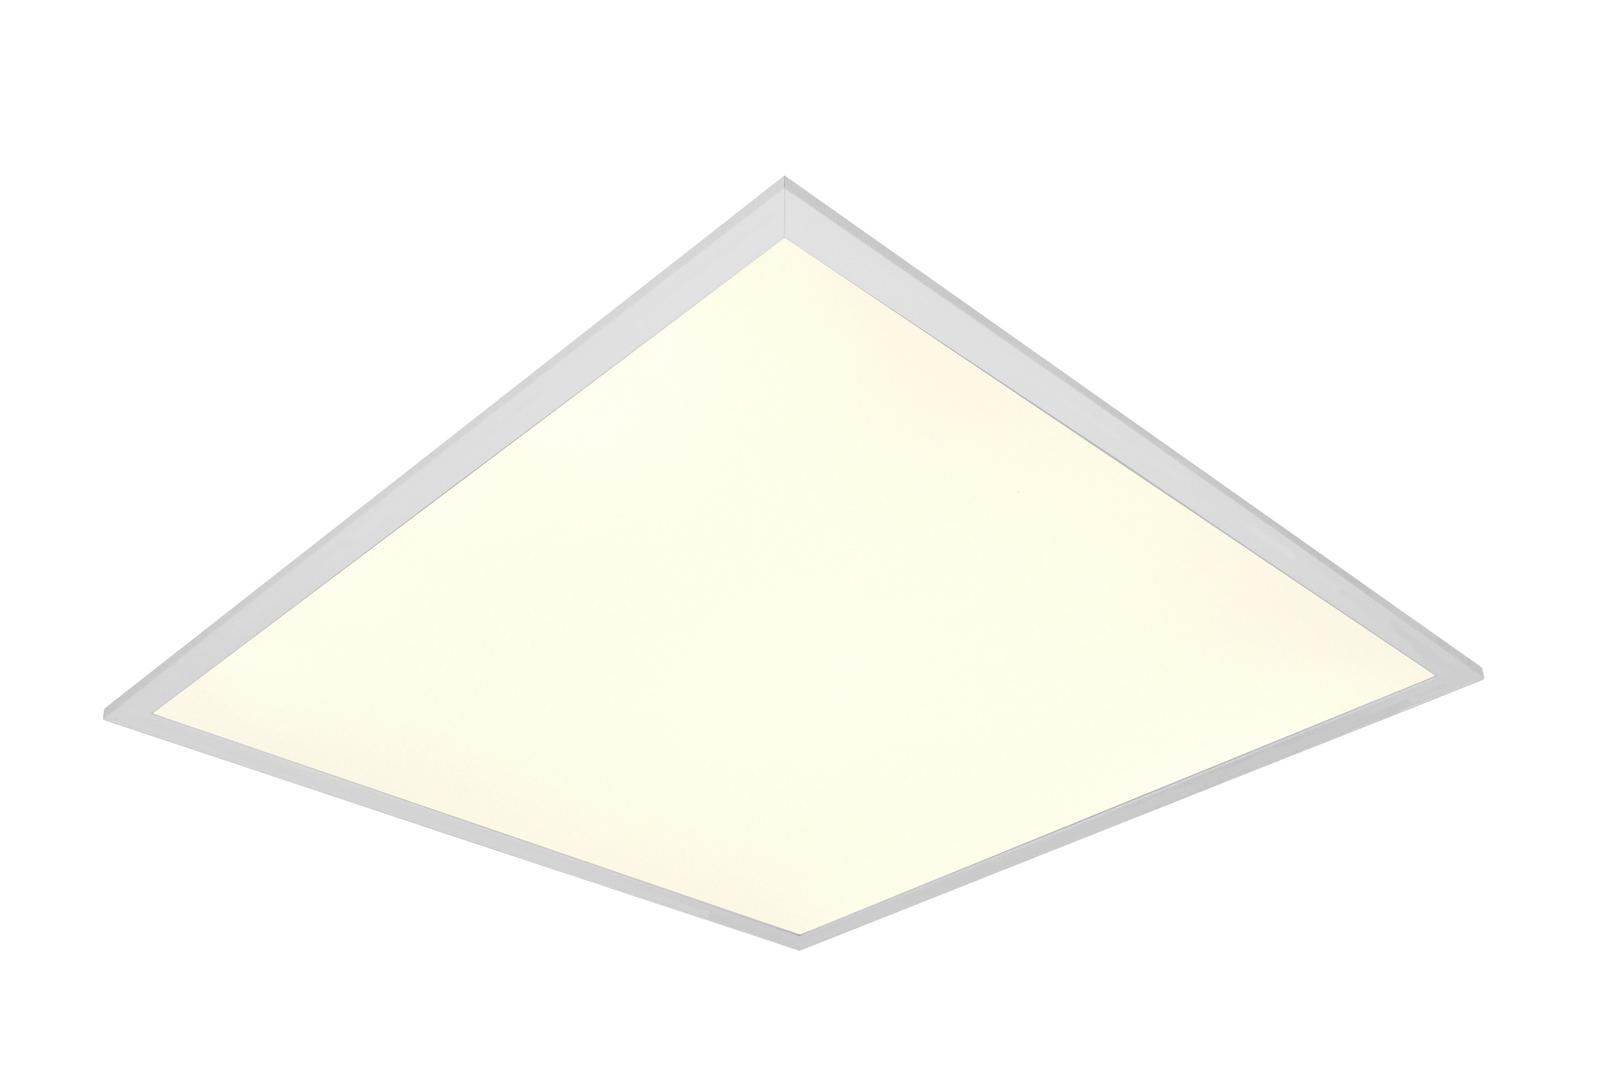 Panel LED biały kwadrat 80W 230V IP20 4000K